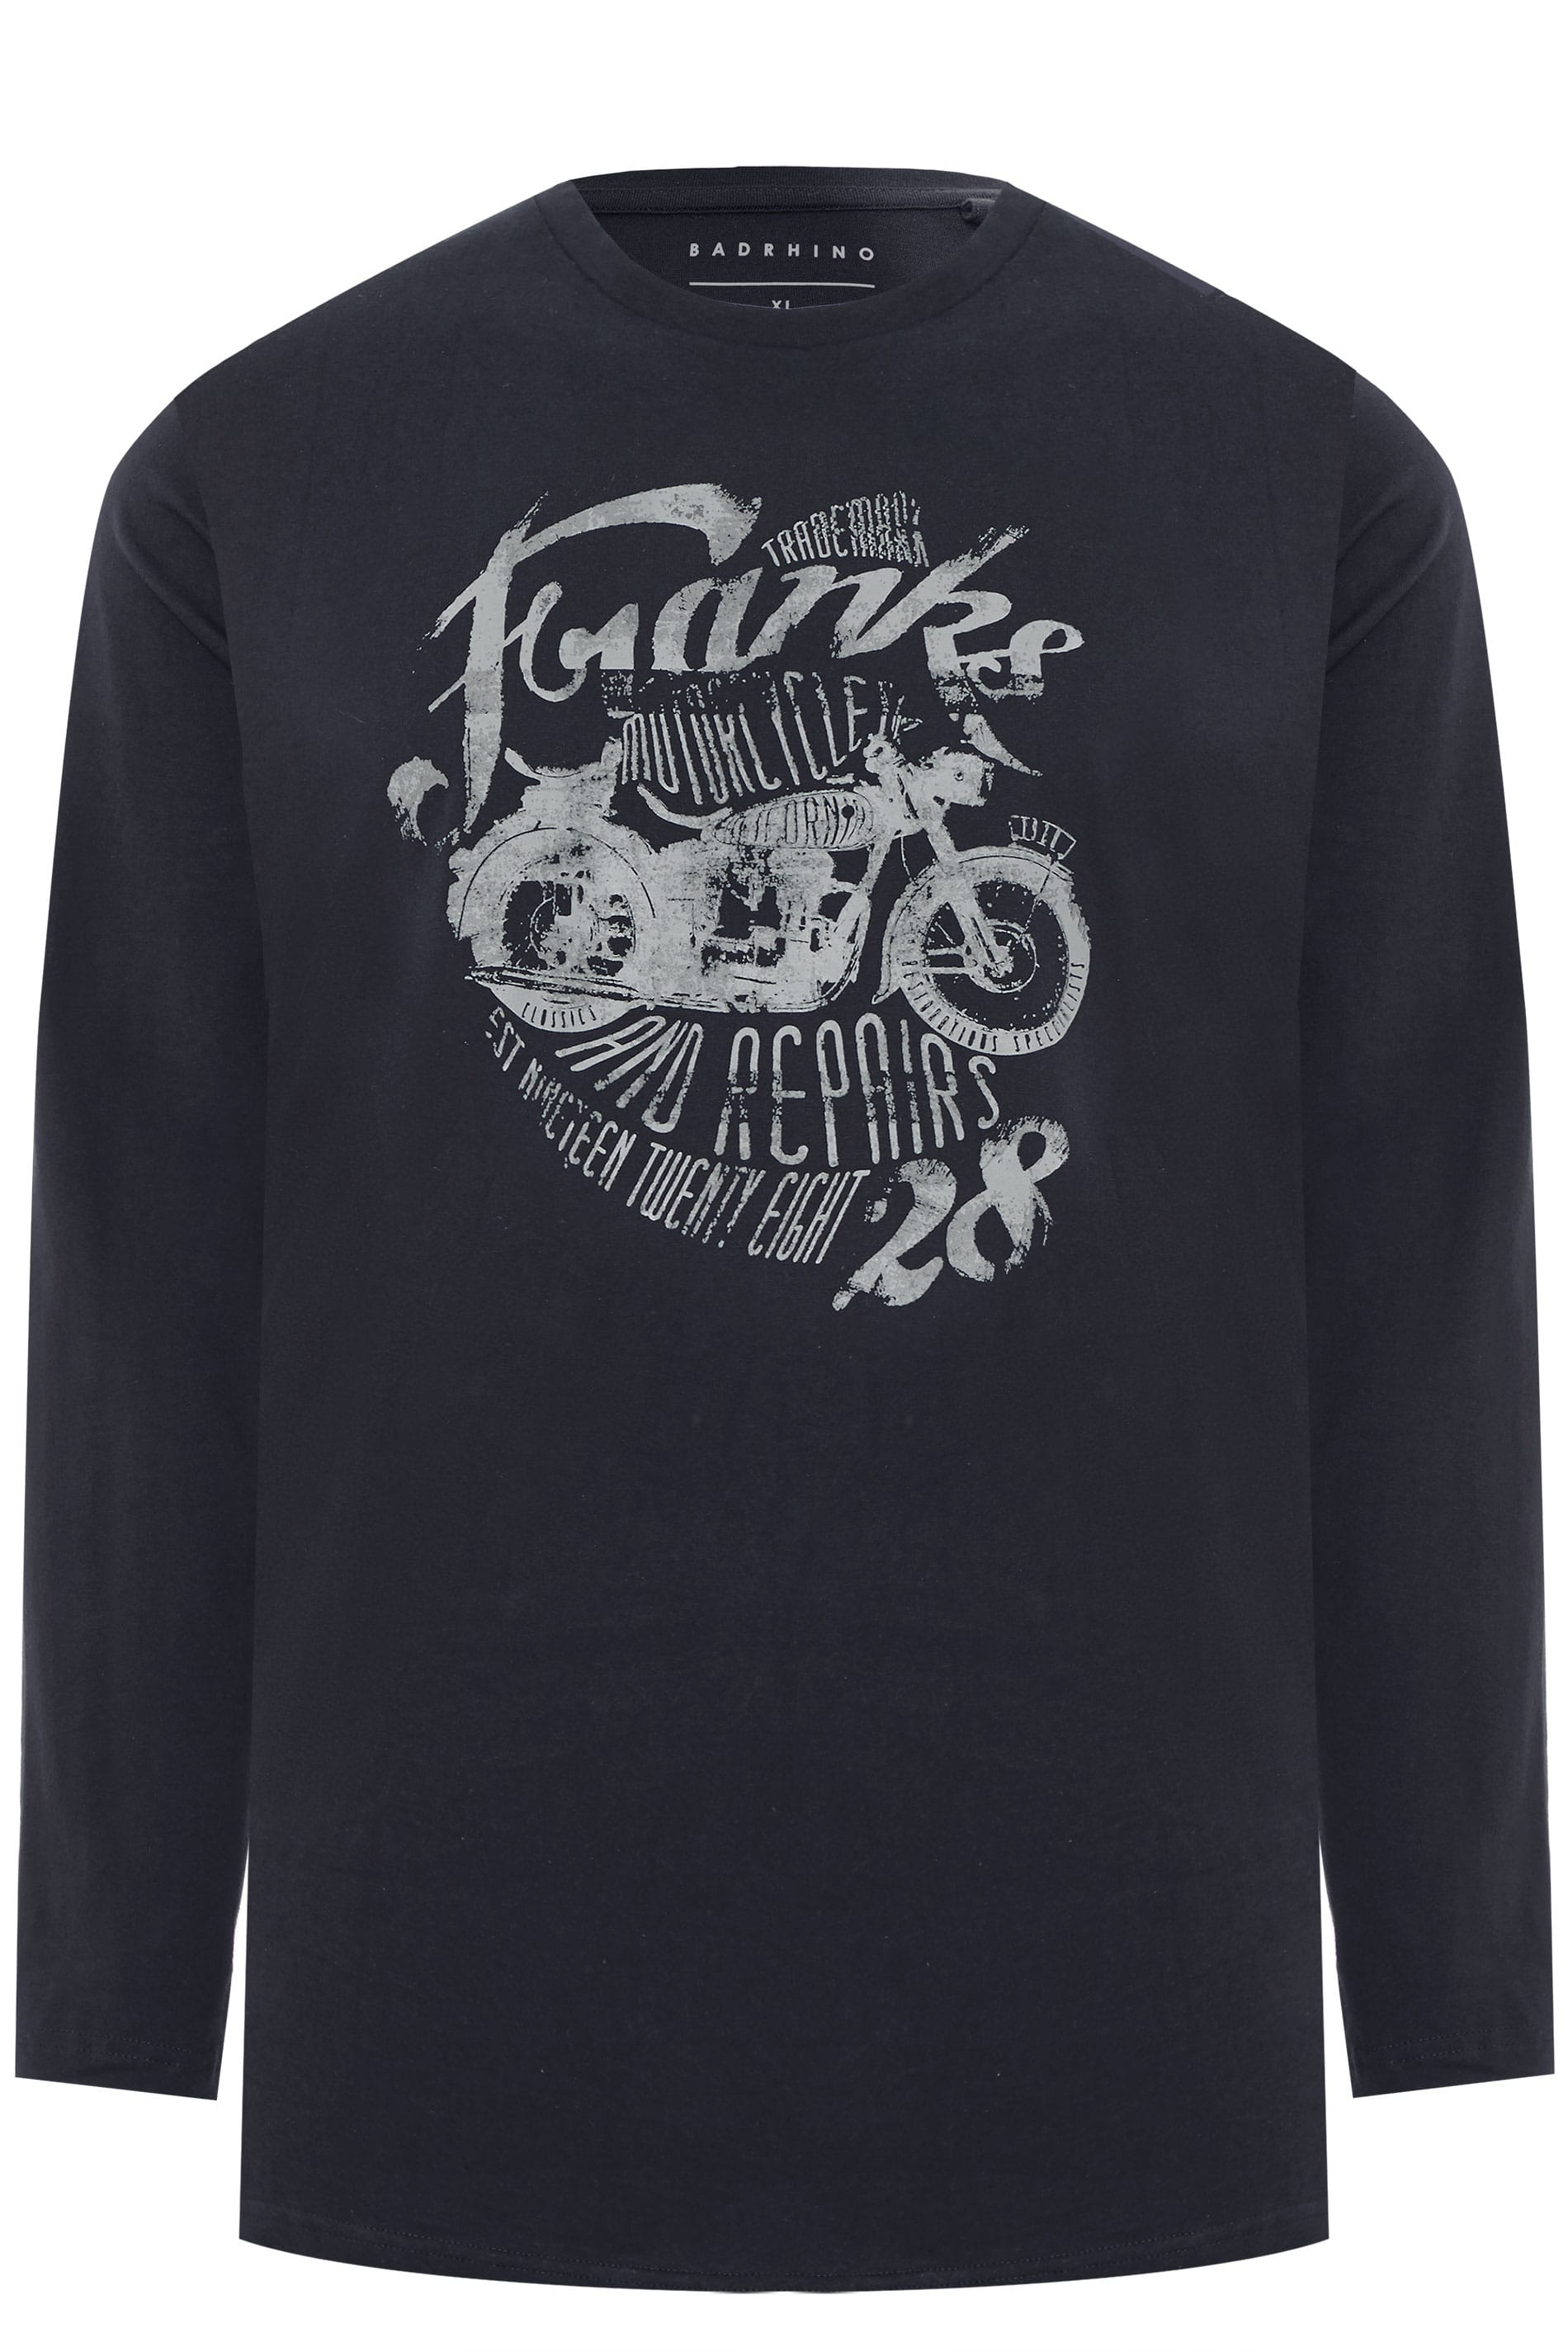 BadRhino Navy Motorcycle Print Long Sleeve T-shirt